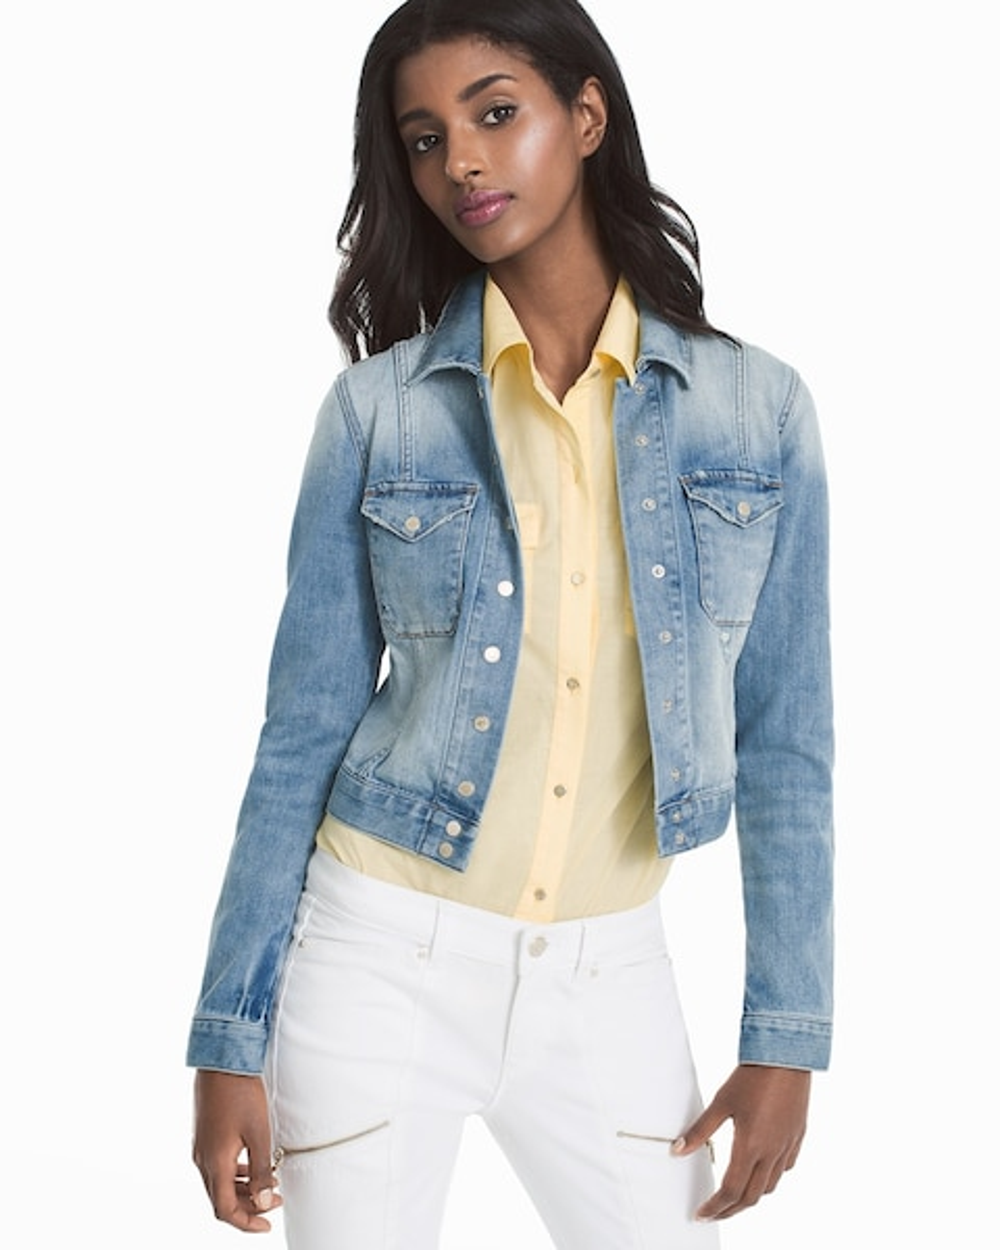 White house black market blue jean jacket